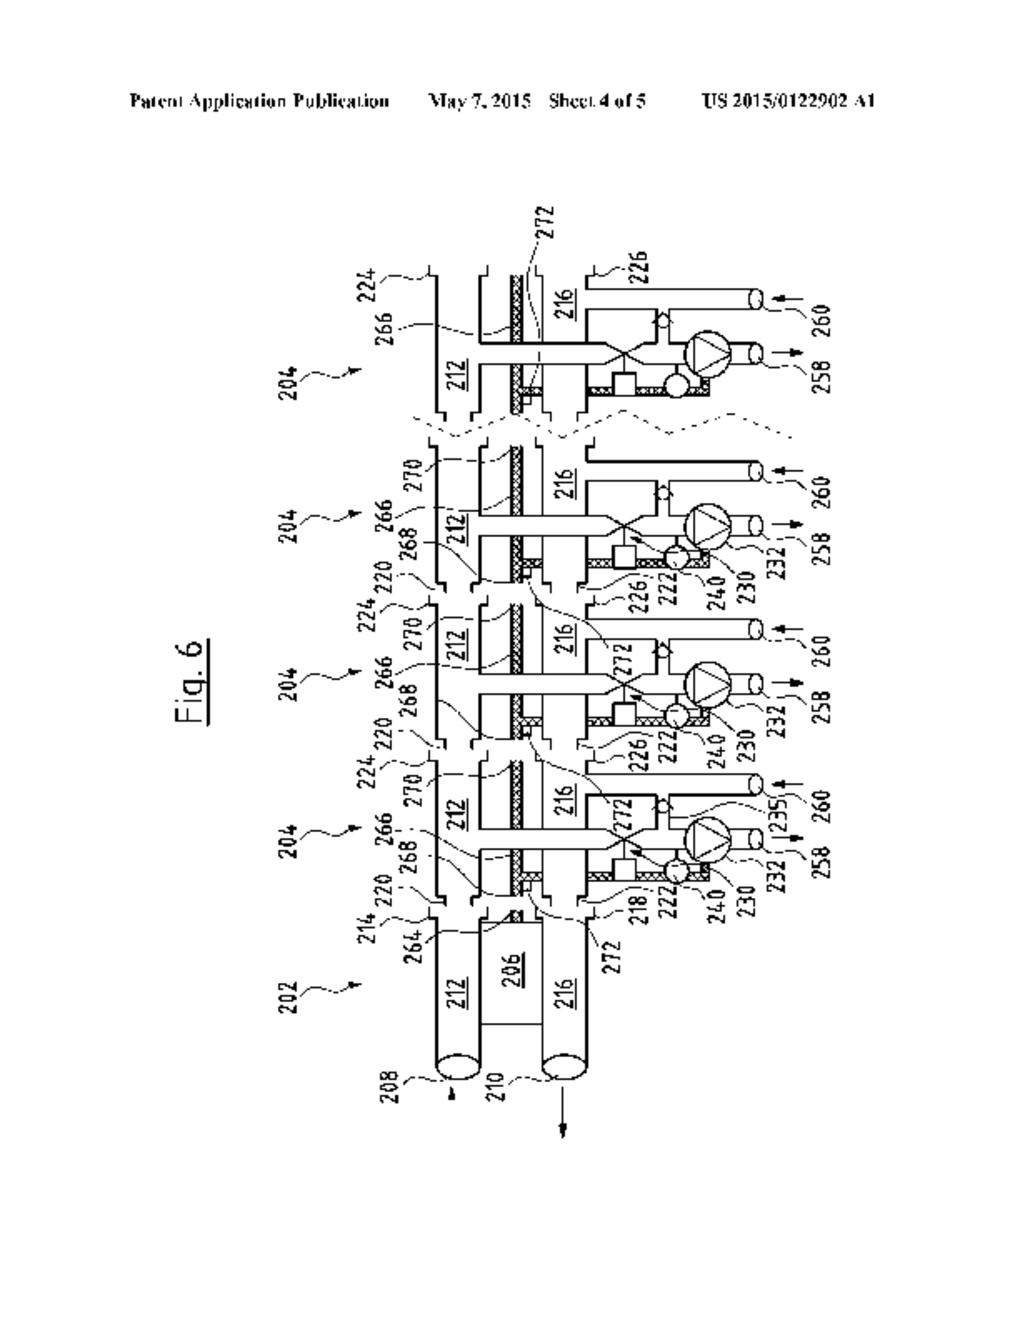 [HG_3718] Hydraulic Manifold Schematic Download Diagram